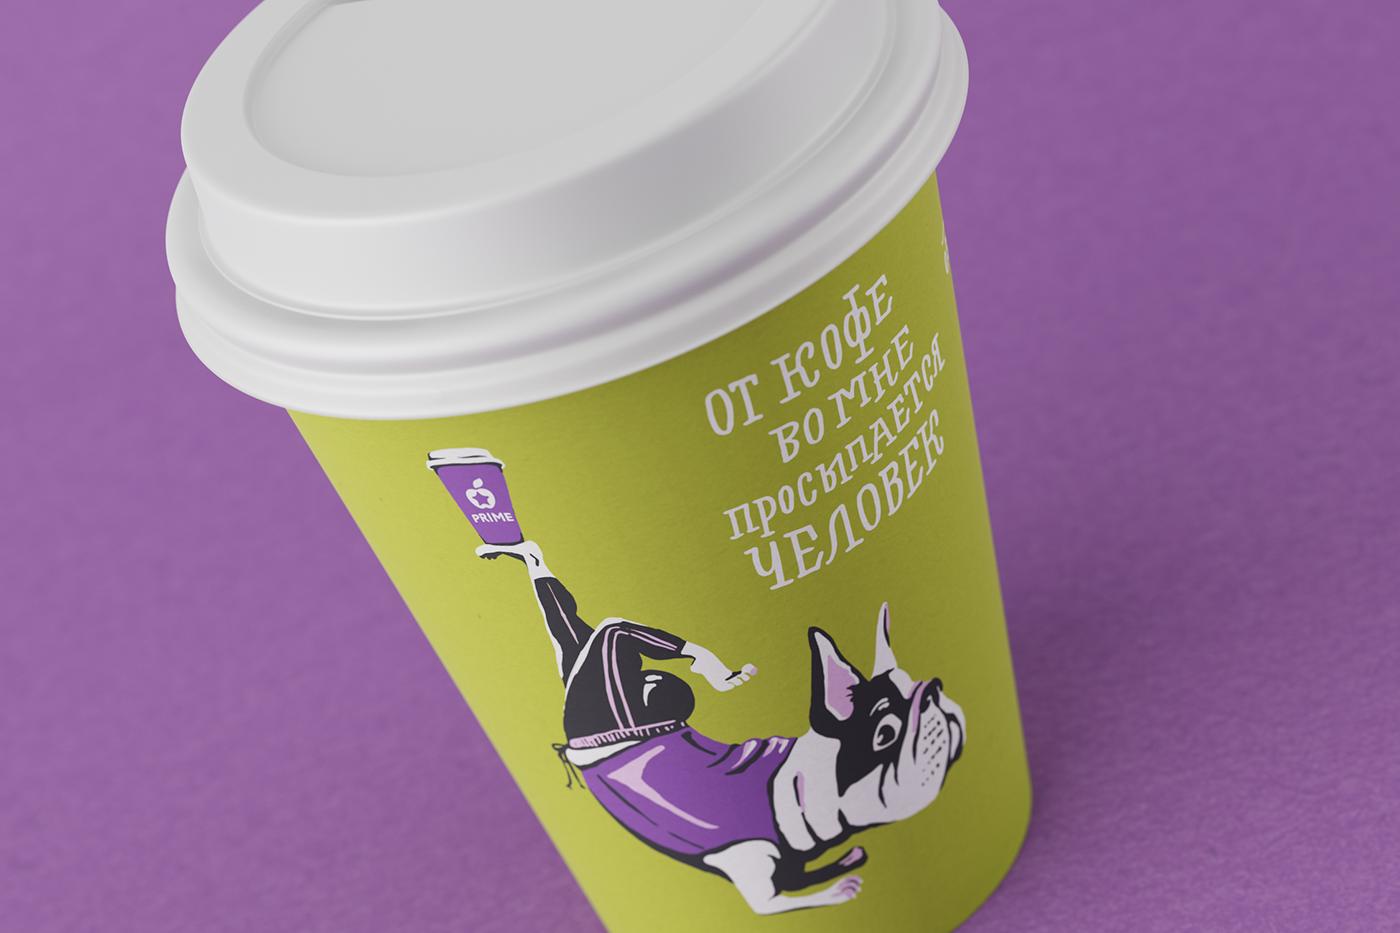 3D CGI Pack package Food  drink fastfood goods Render bottle